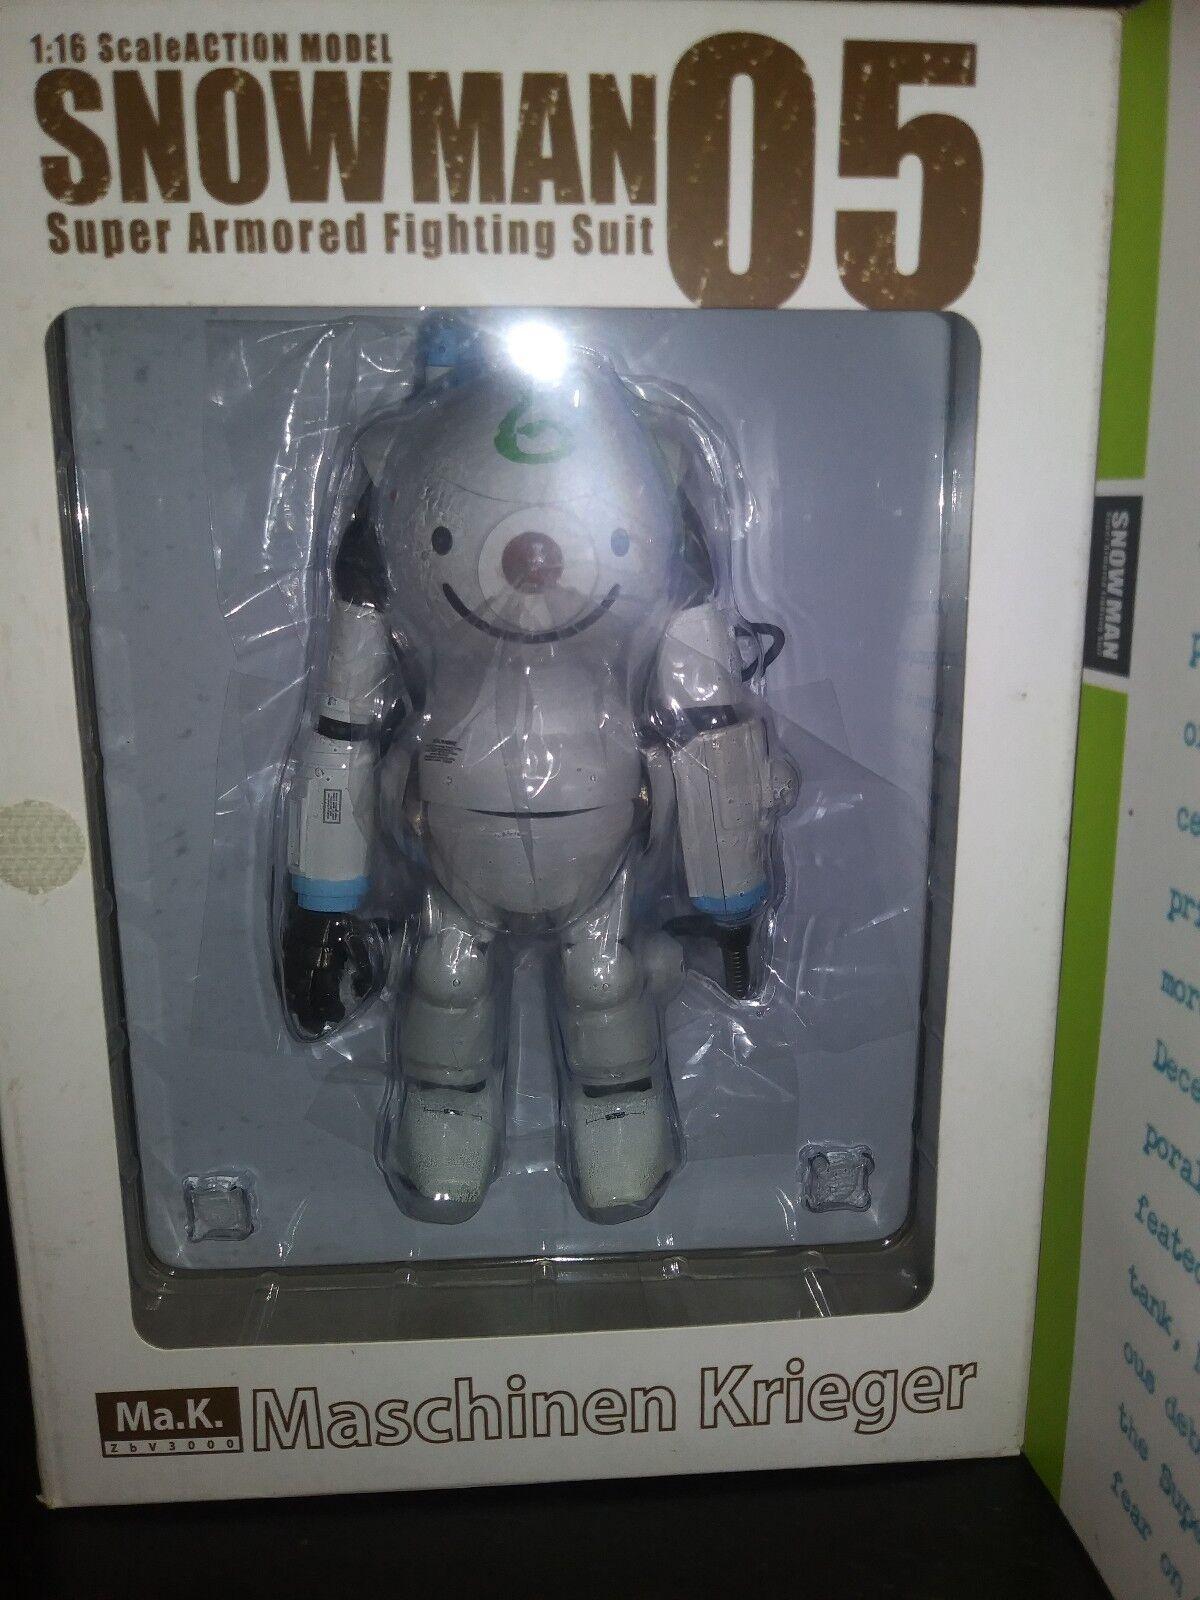 Snowman 05 Super Super Super Armored Fighting Suit b3ead2